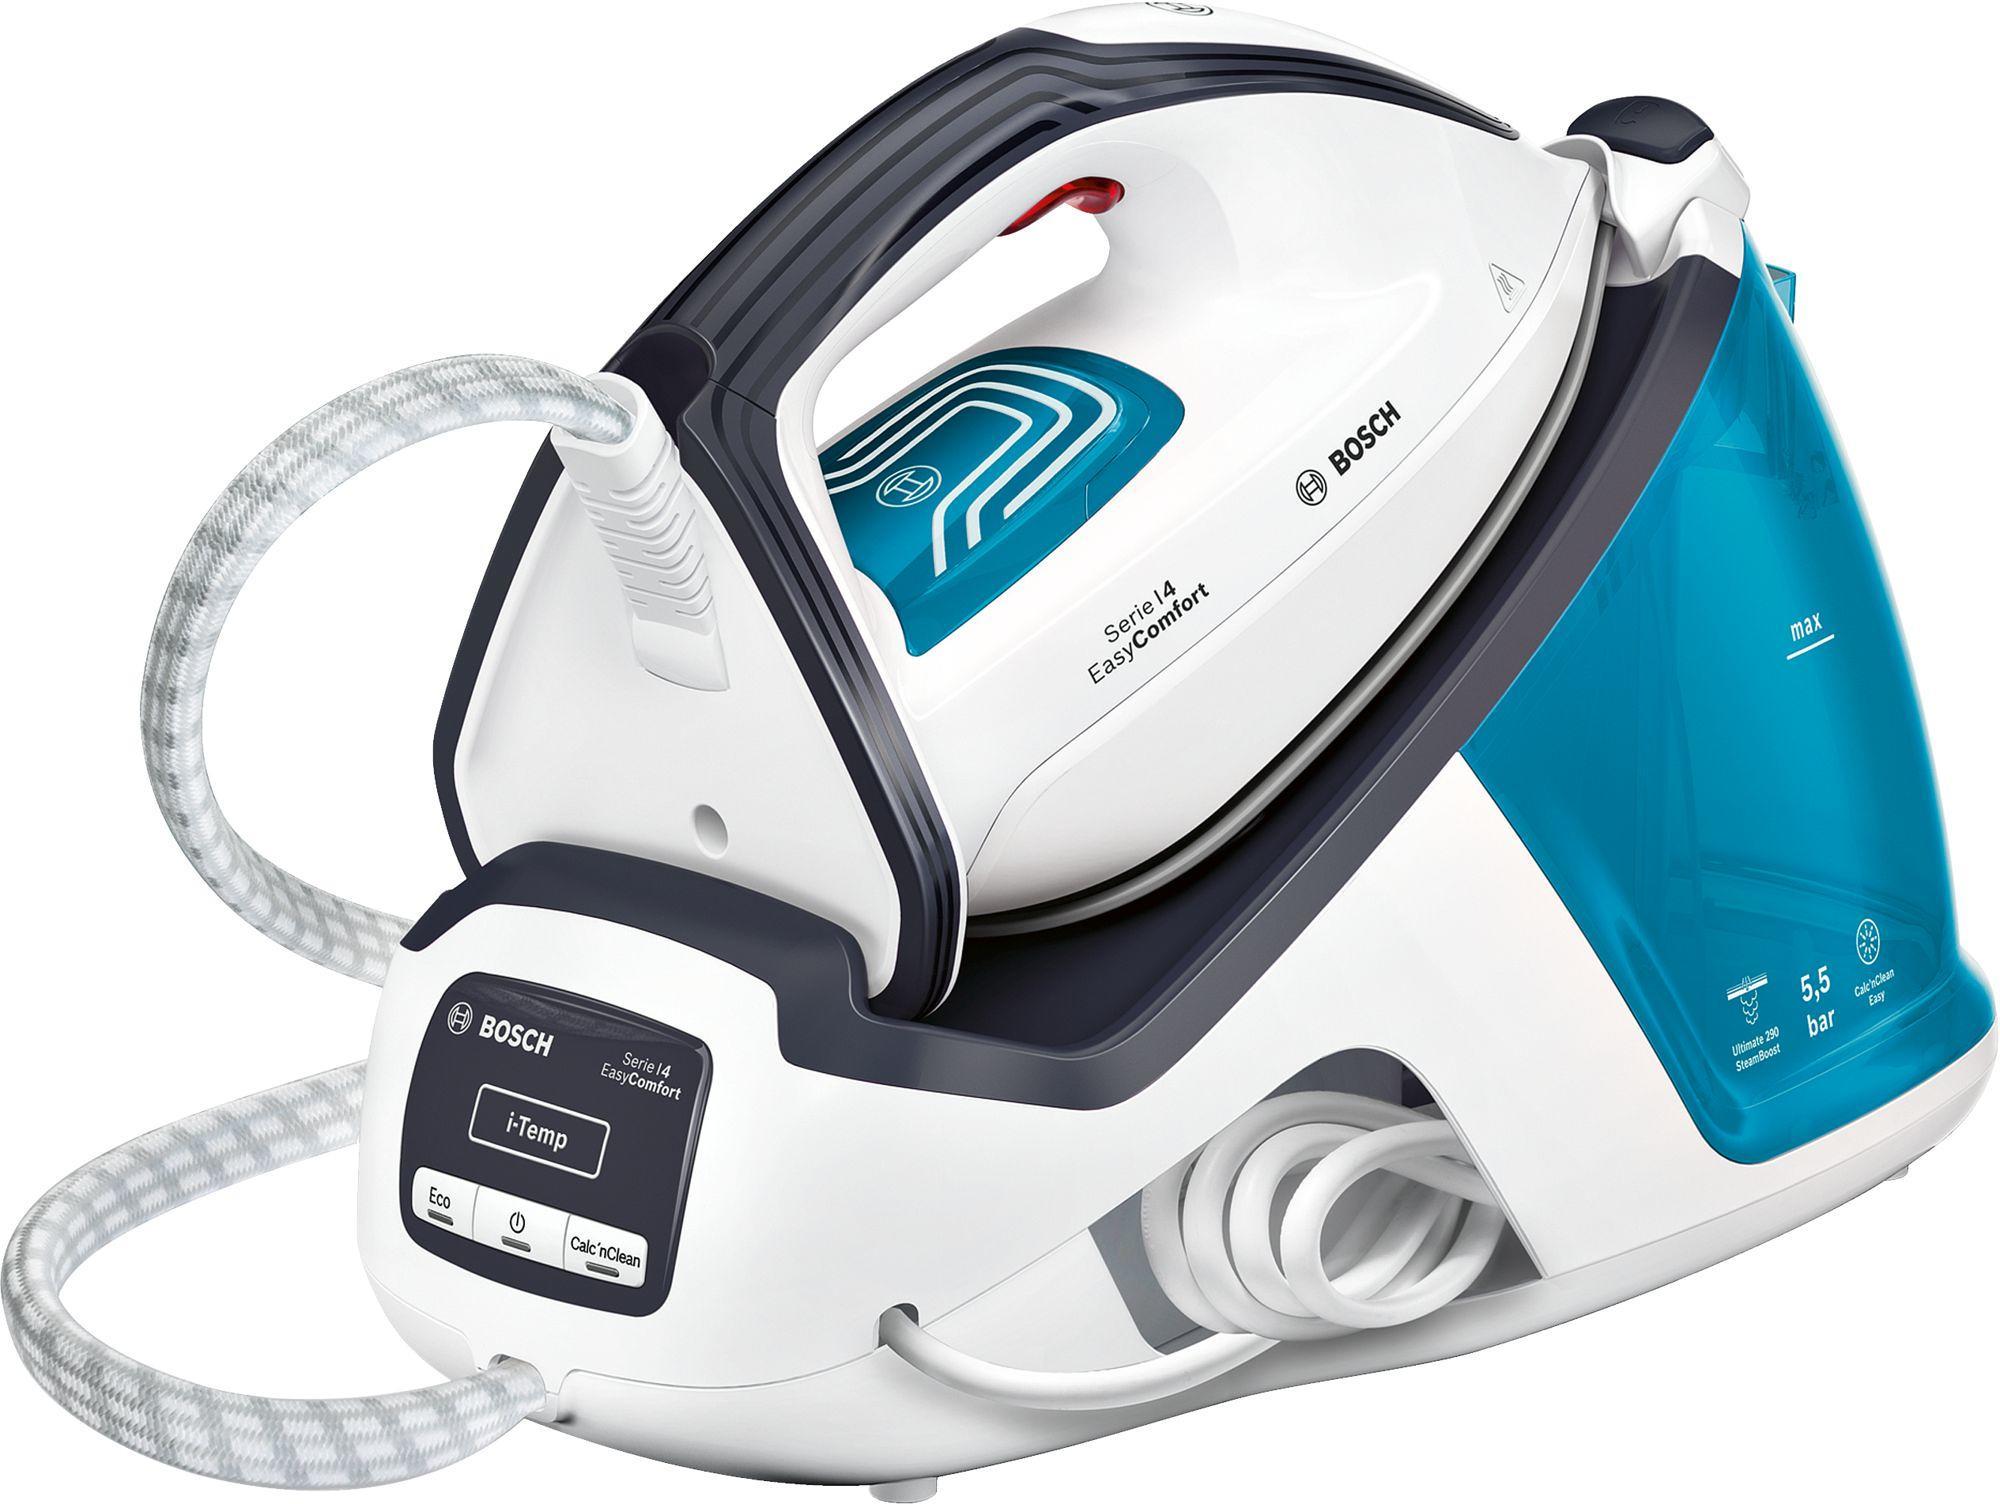 Bosch Bügeleisen Dampfbügeleisen Sensixx/'x EasyComfort I-Temp Advance System